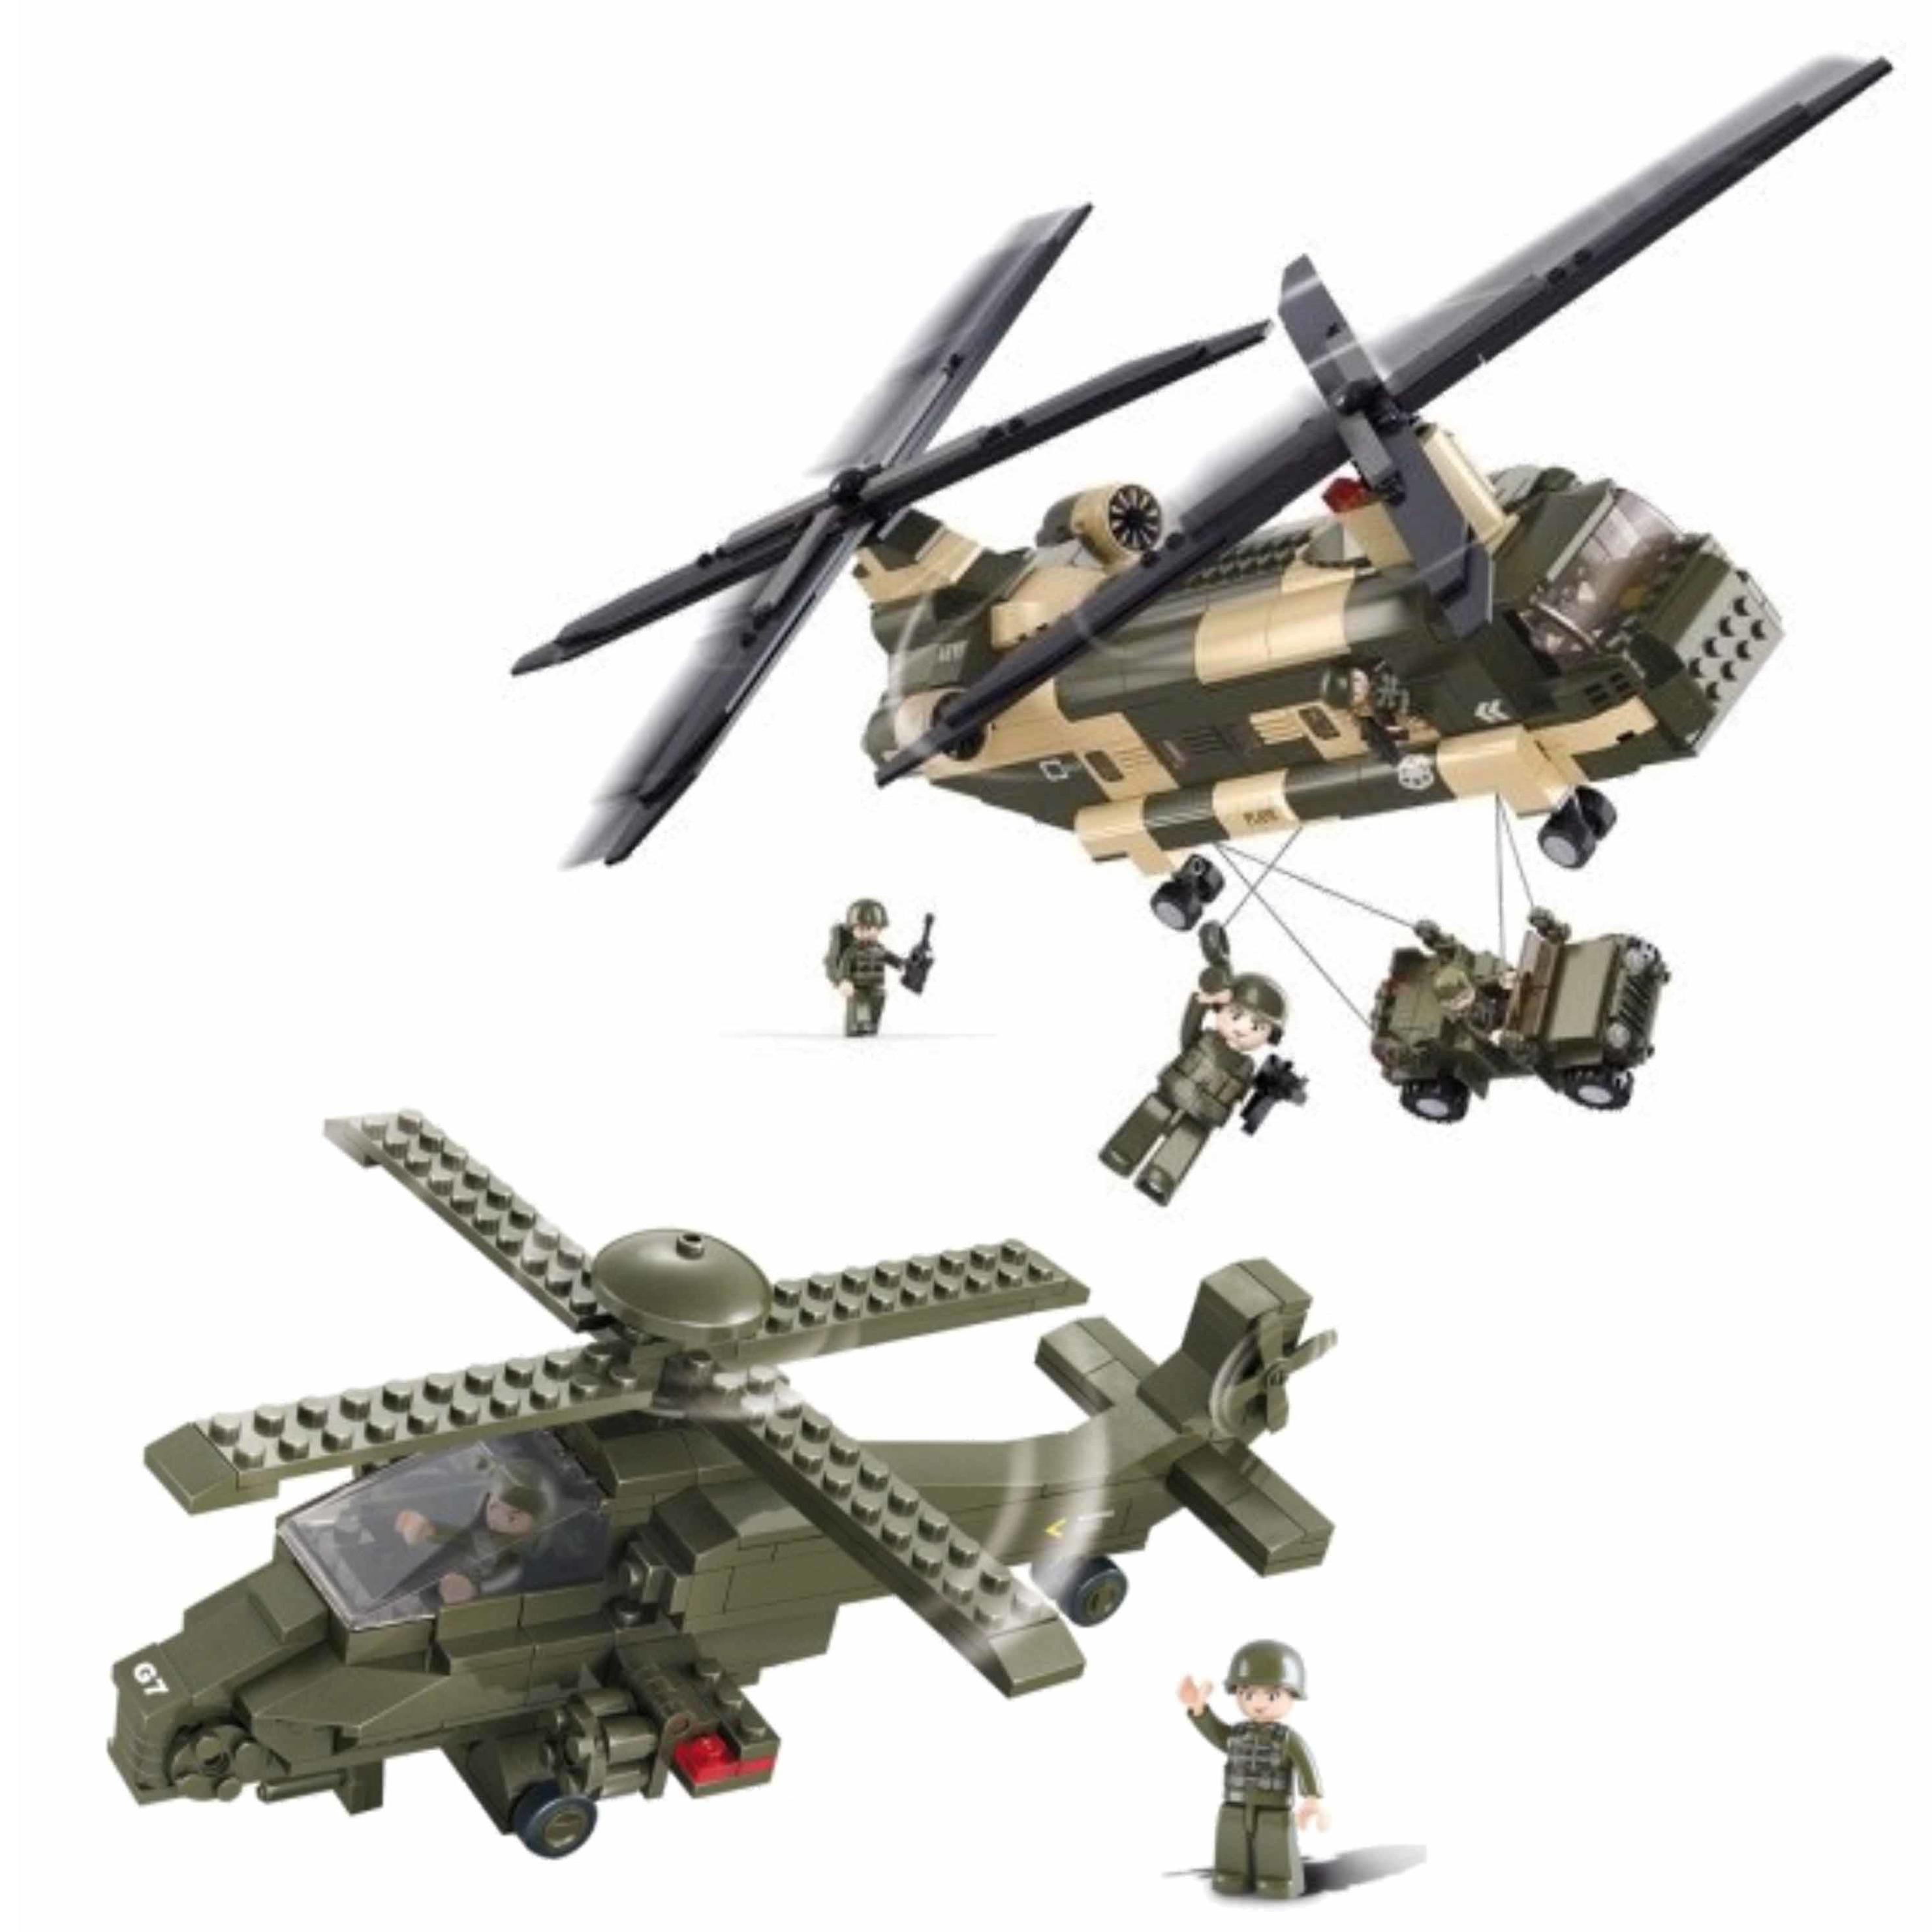 Leger soldaten speelgoed set van sluban 2x army helikopters van 43 en 28 cm